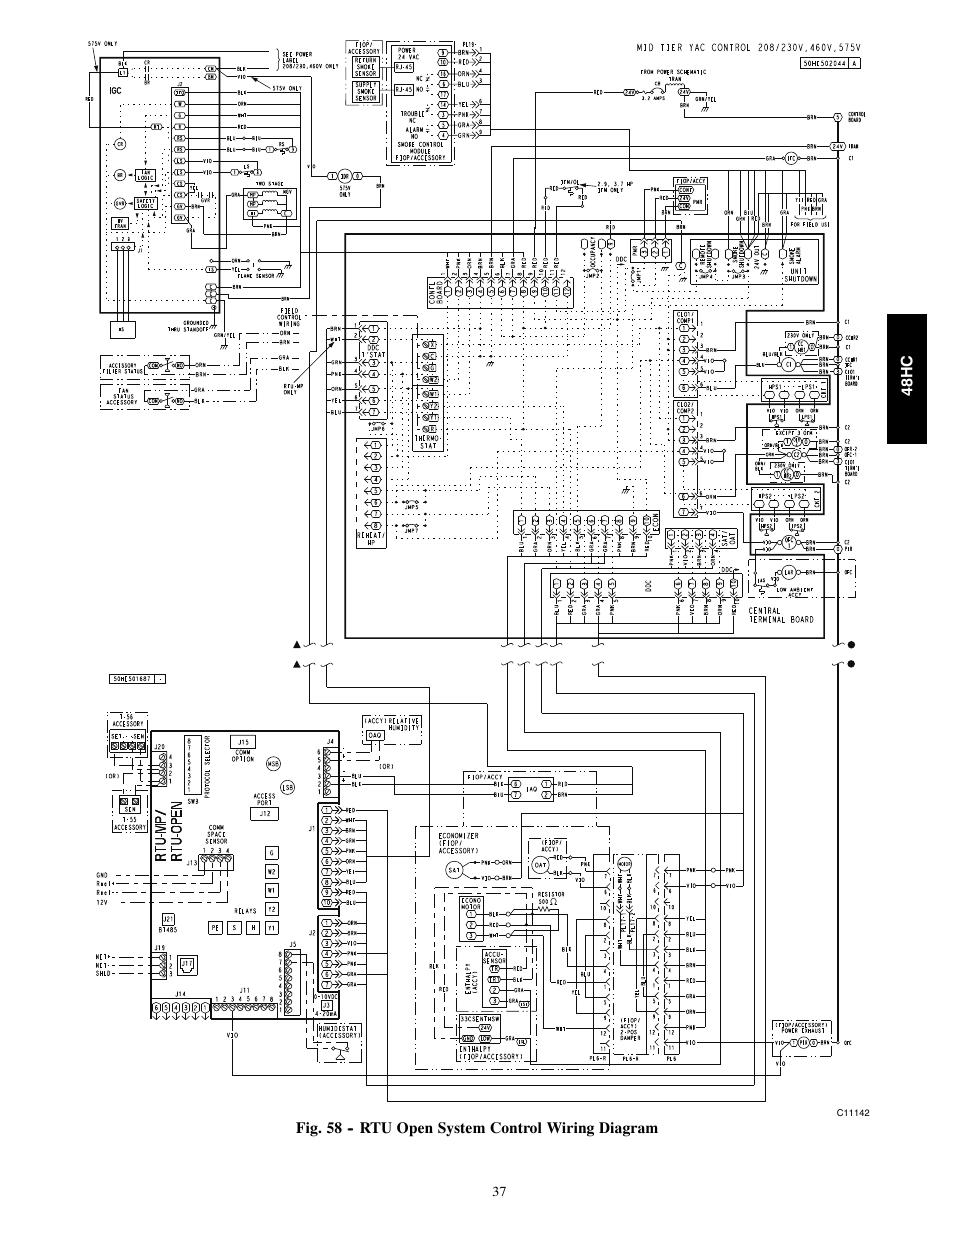 medium resolution of carrier 48 series wiring diagram 32 wiring diagram carrier package unit wiring carrier package unit wiring diagram pdf